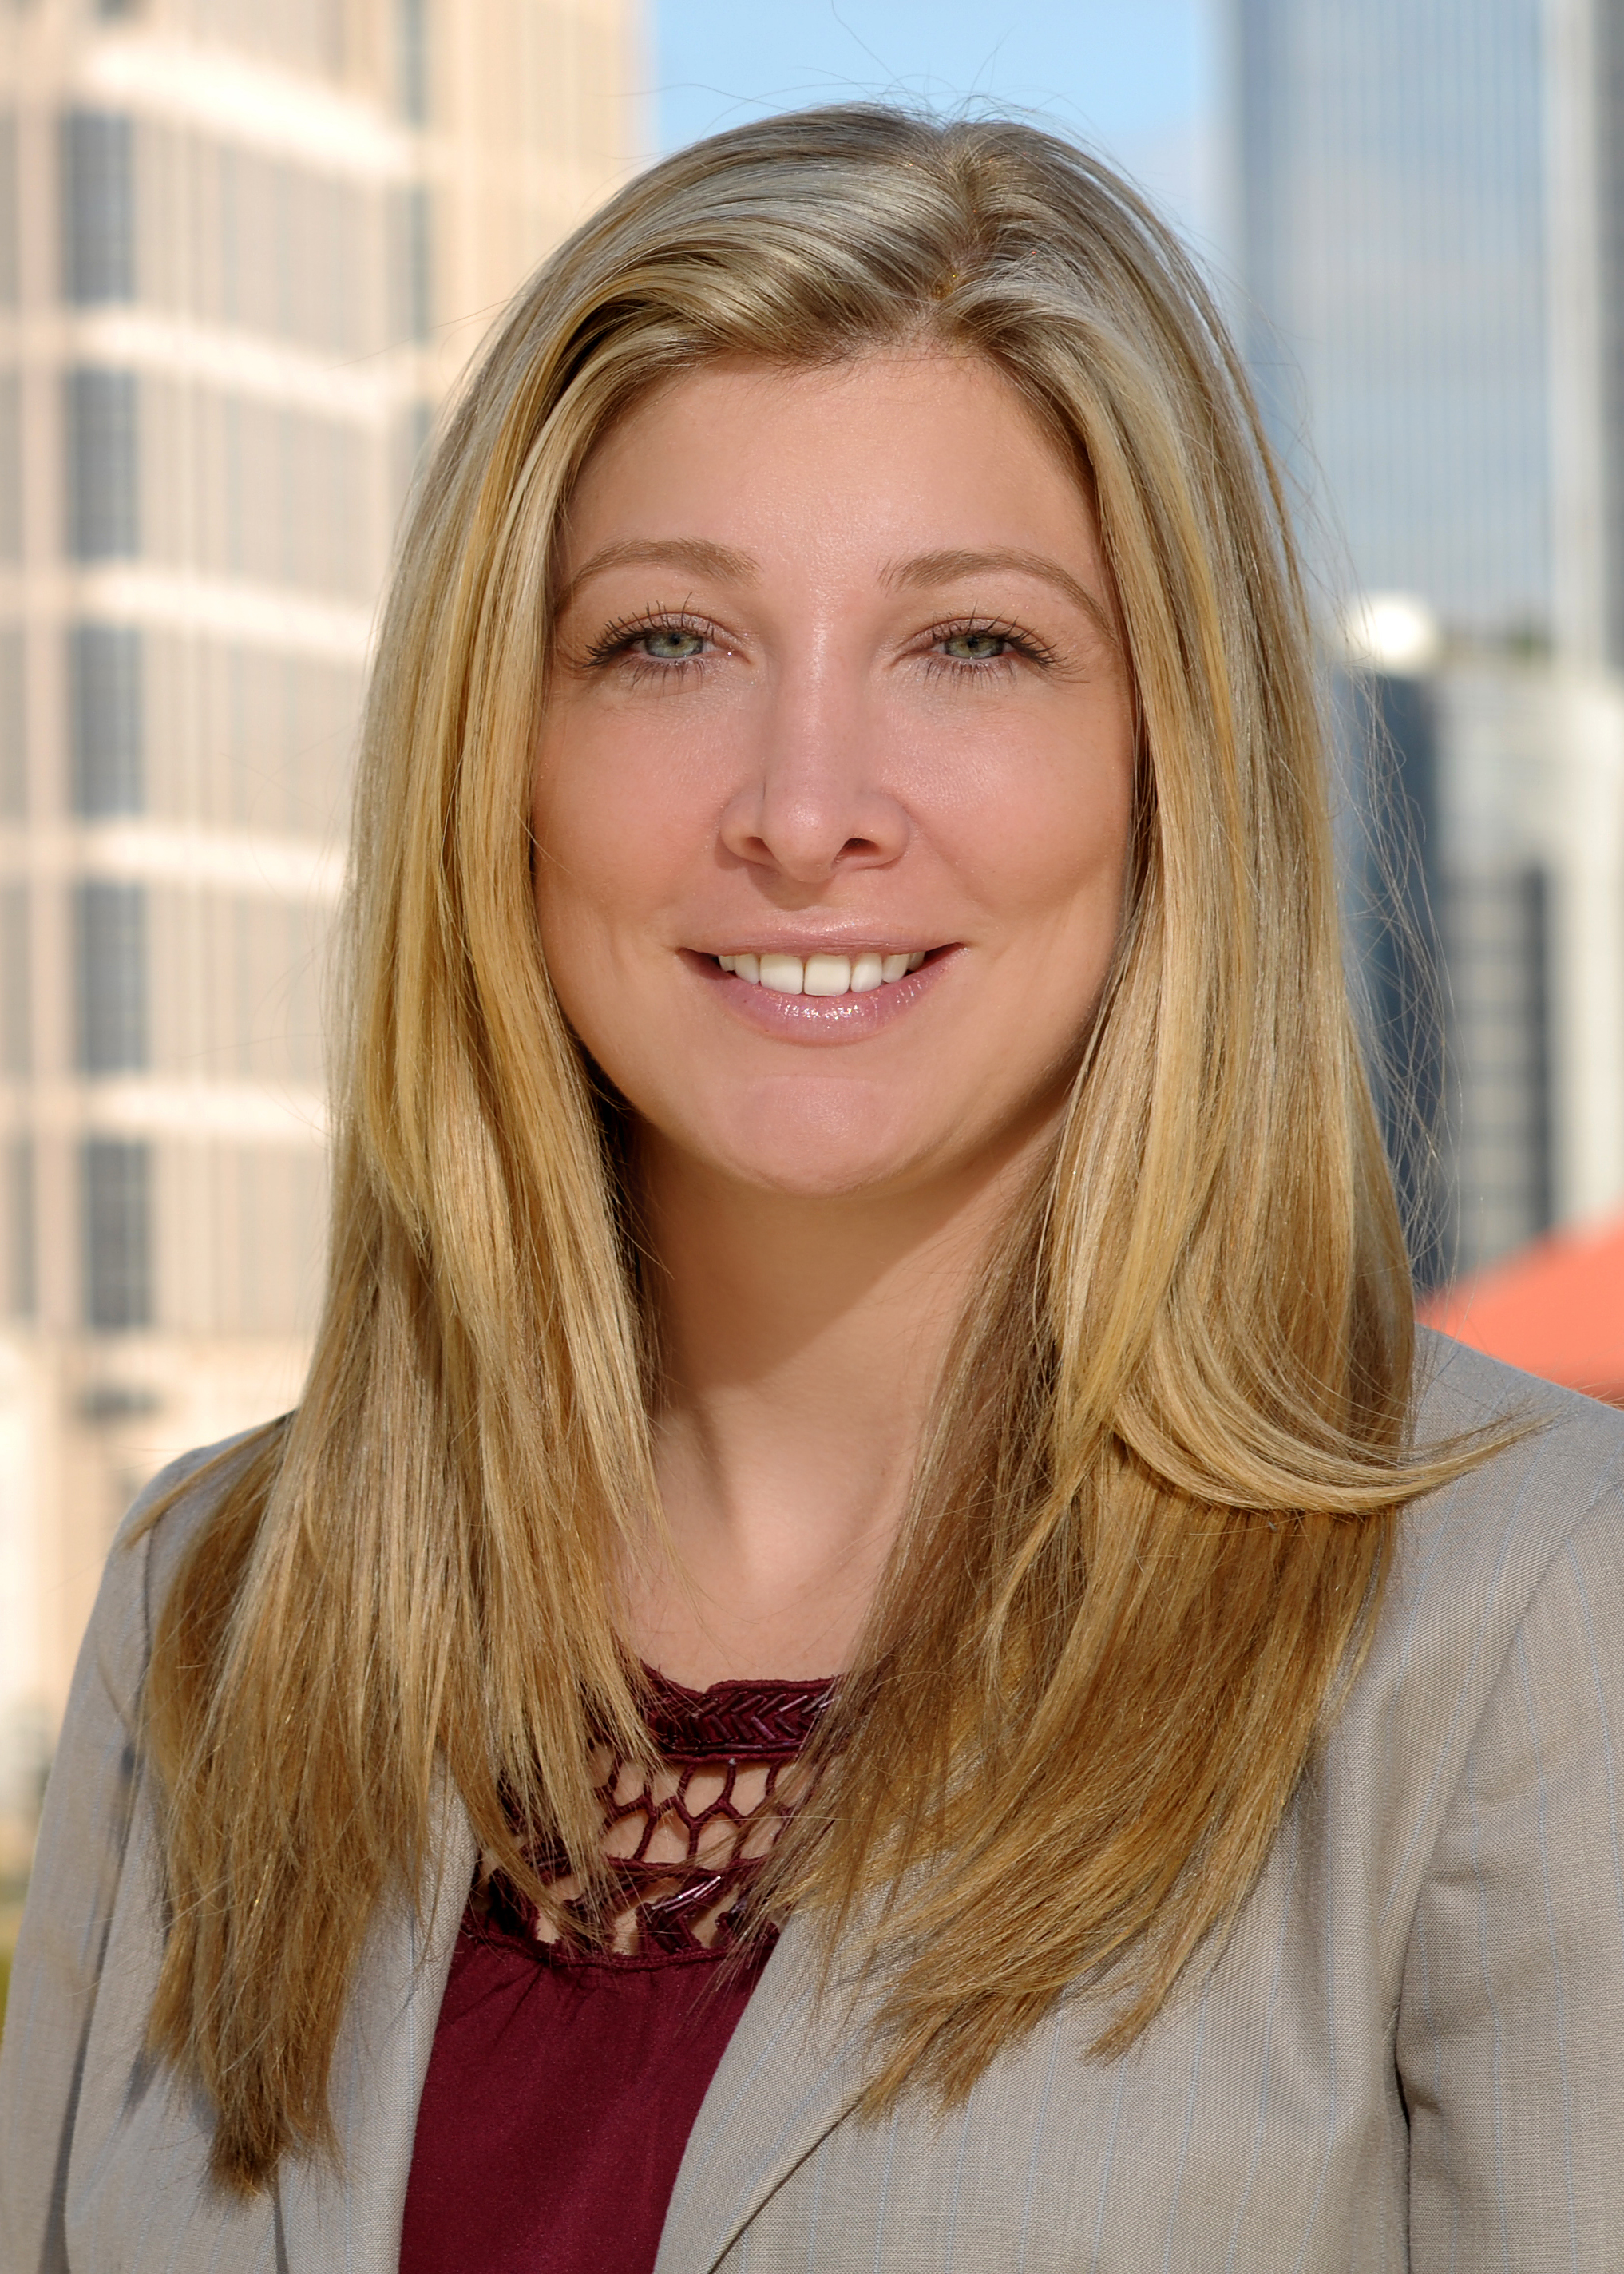 Ariane McClure